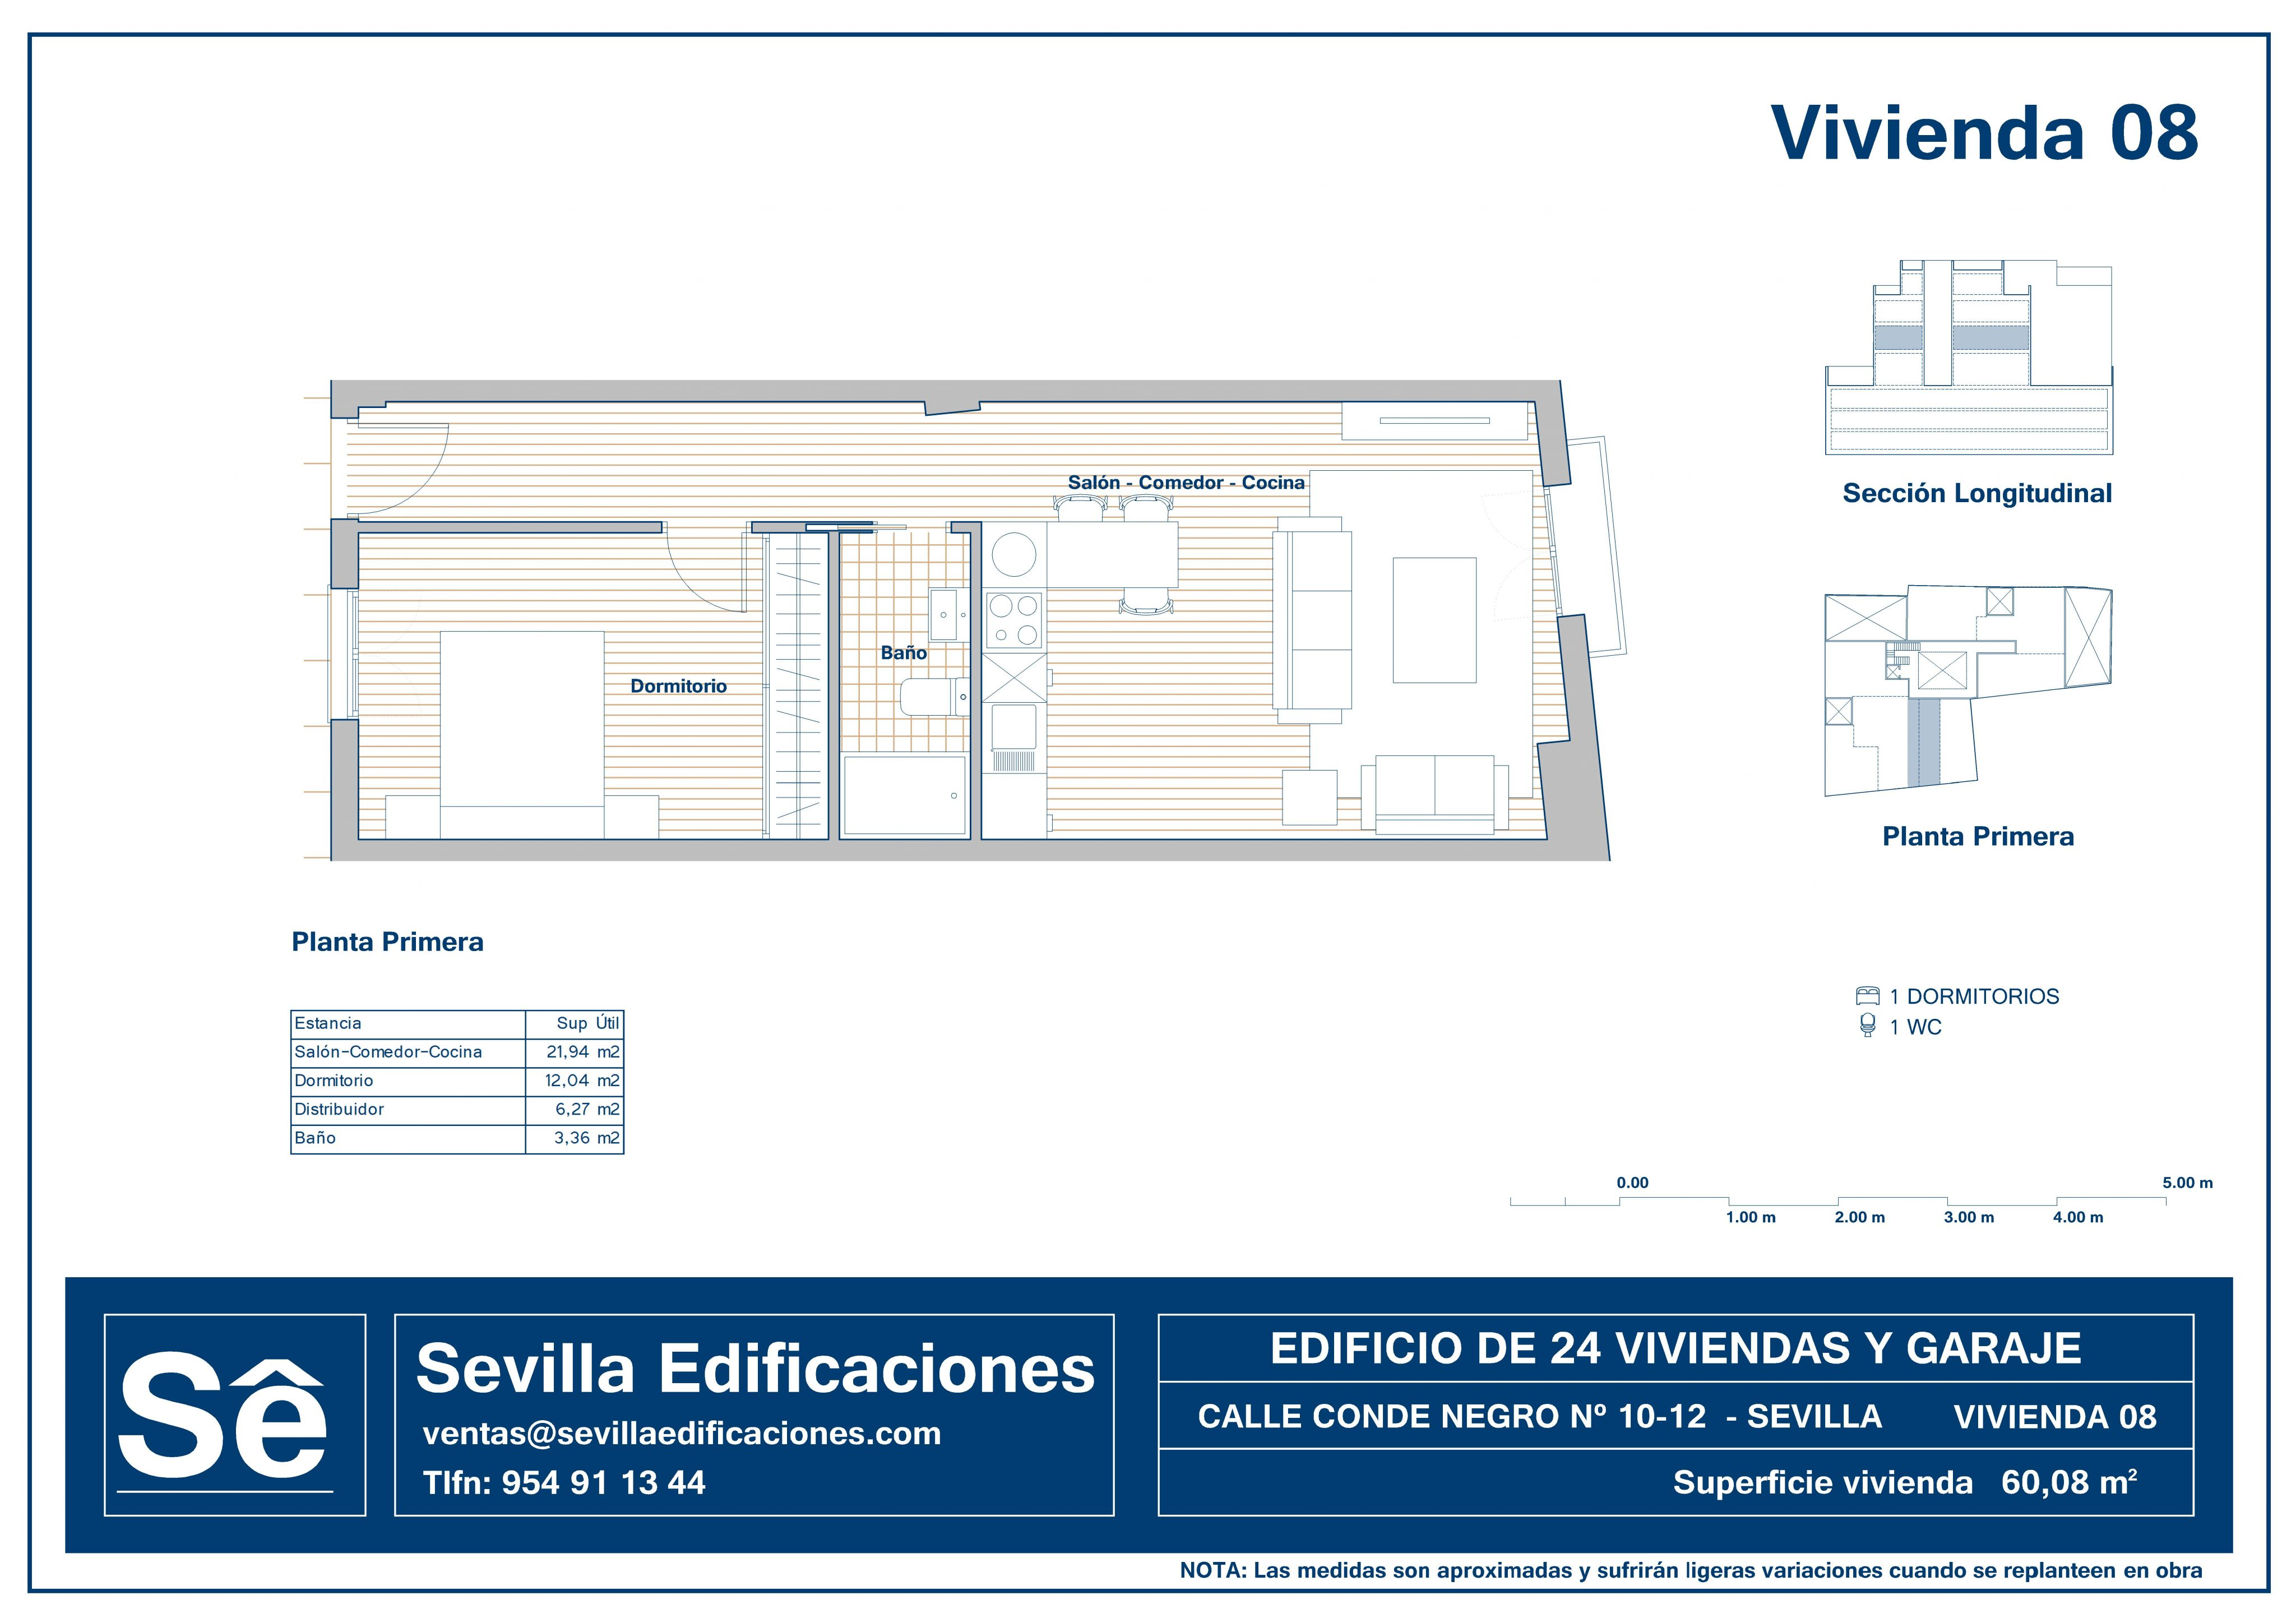 CONDENEGRO_VIVIENDA_08